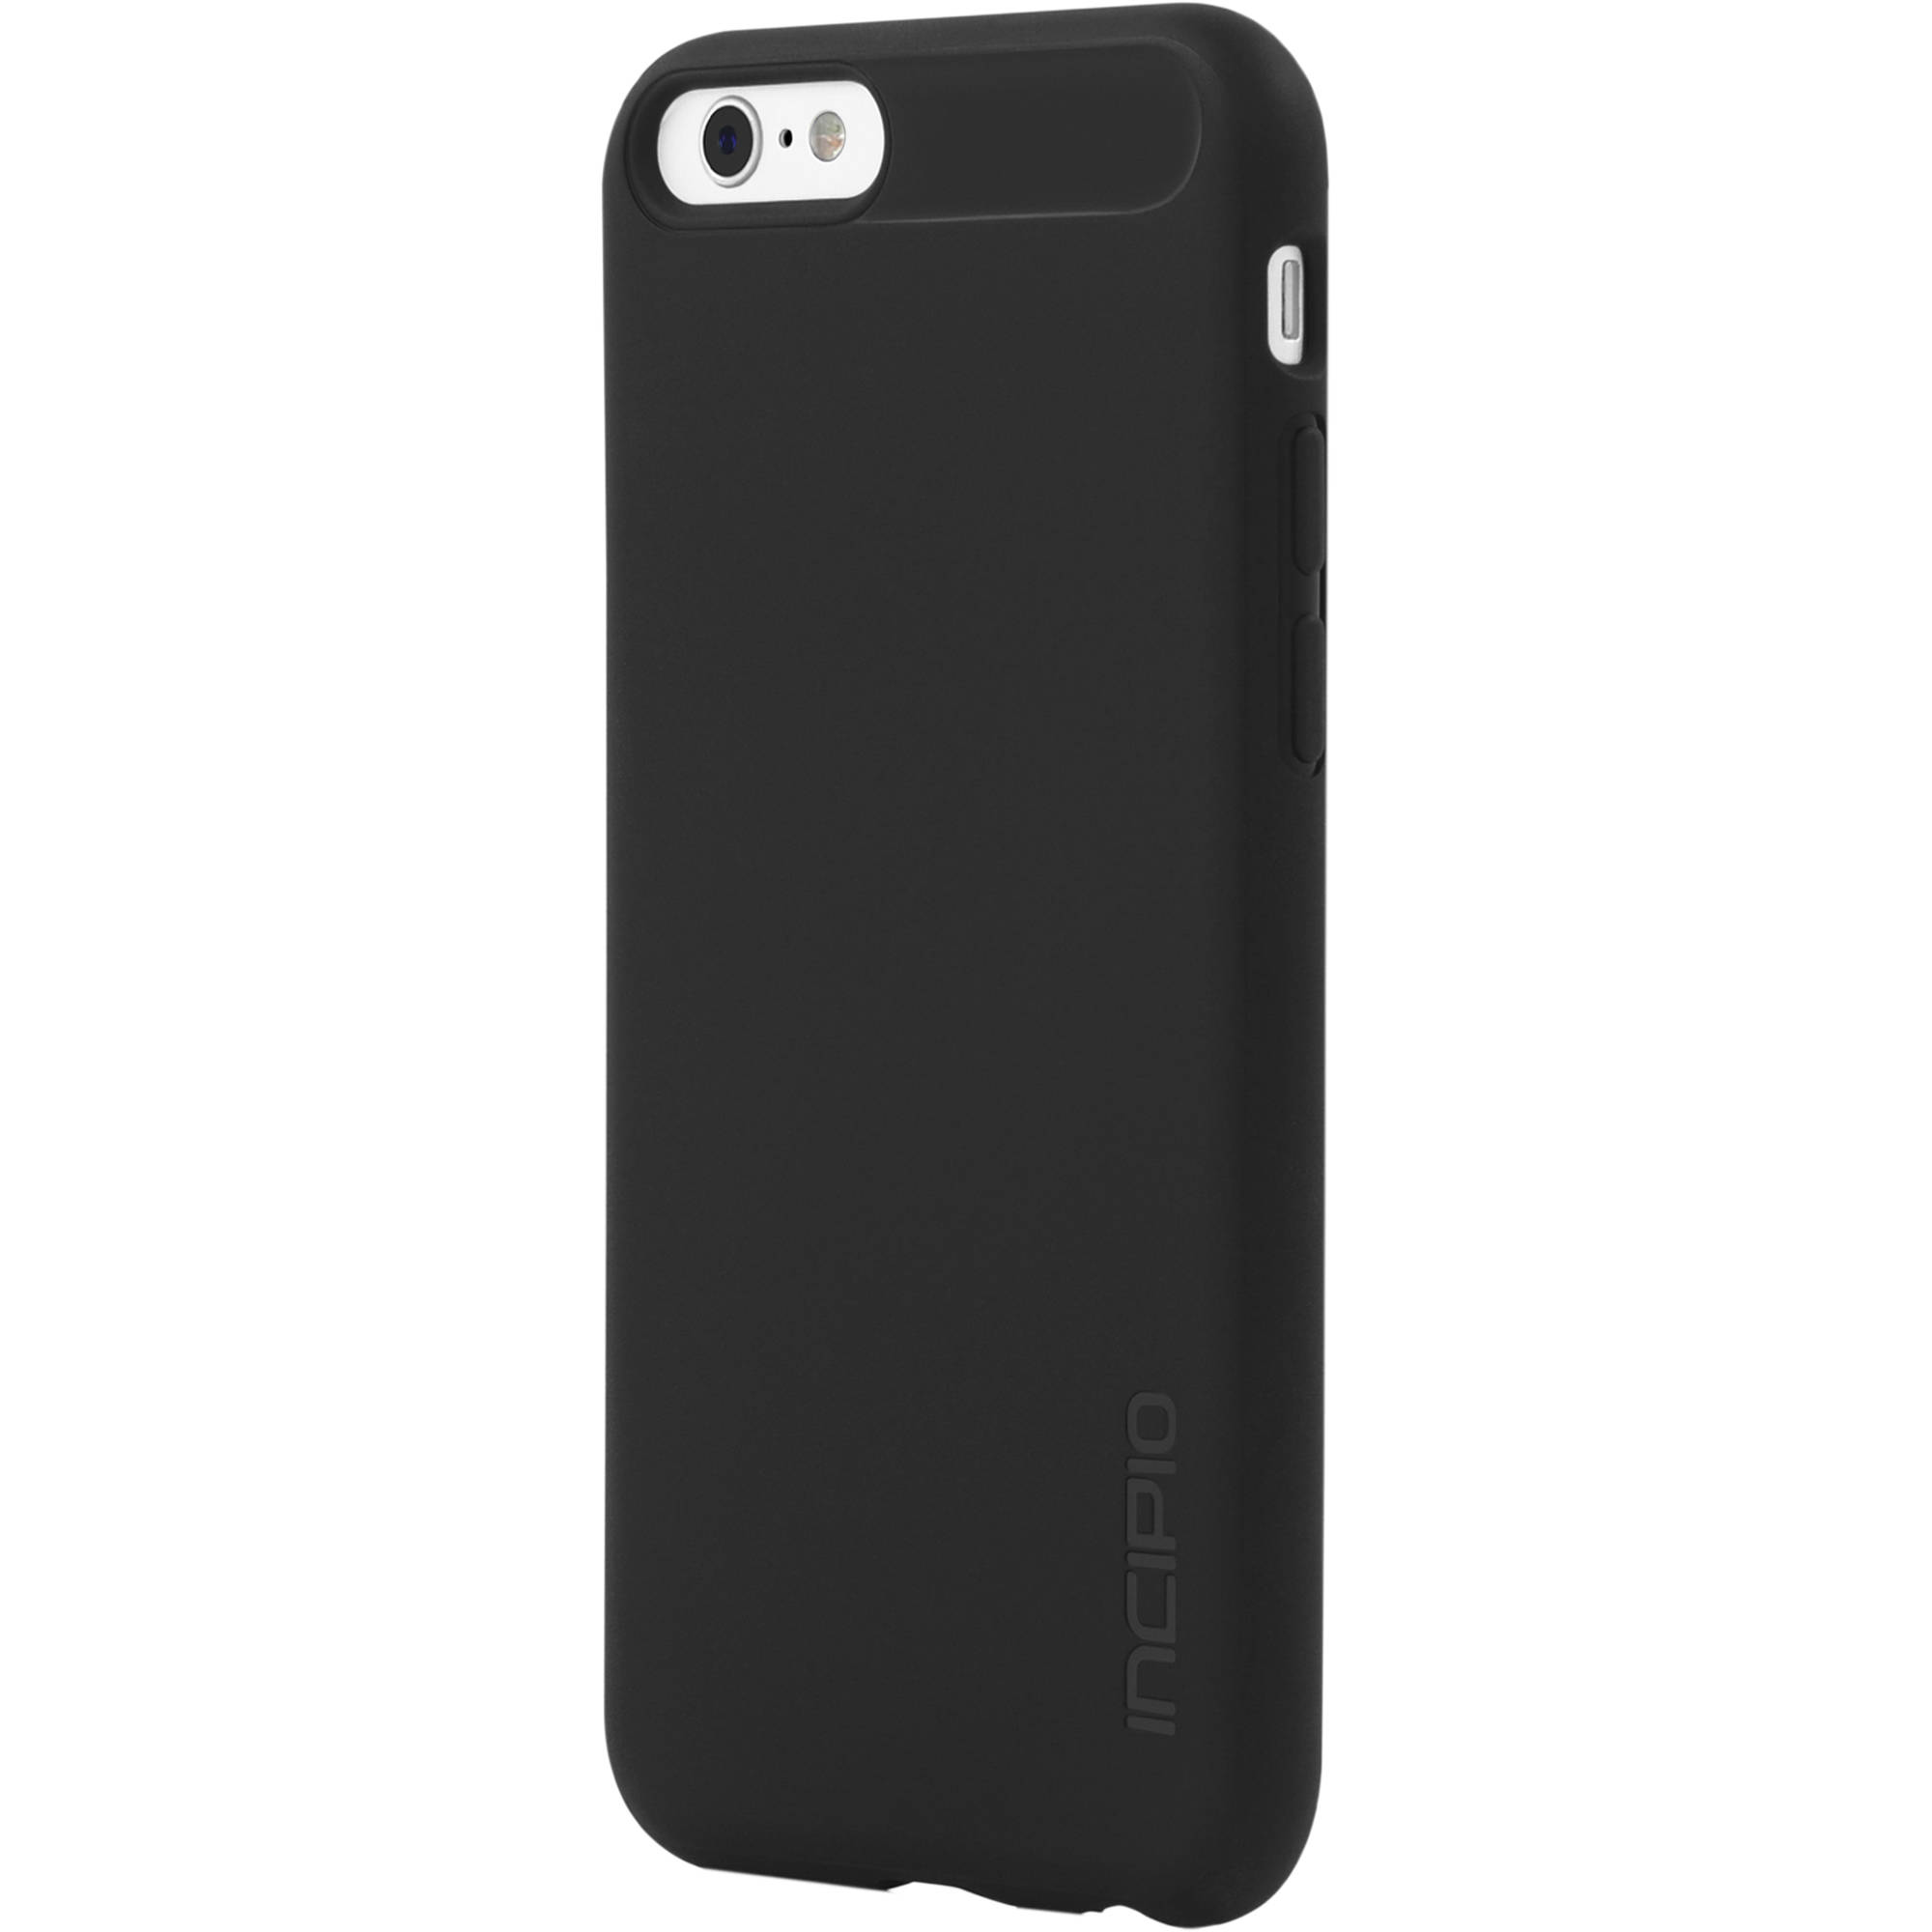 buy online 24284 c91f2 Incipio NGP Flexible Shock Absorbent Case for the iPhone 6/7/8 (Black)